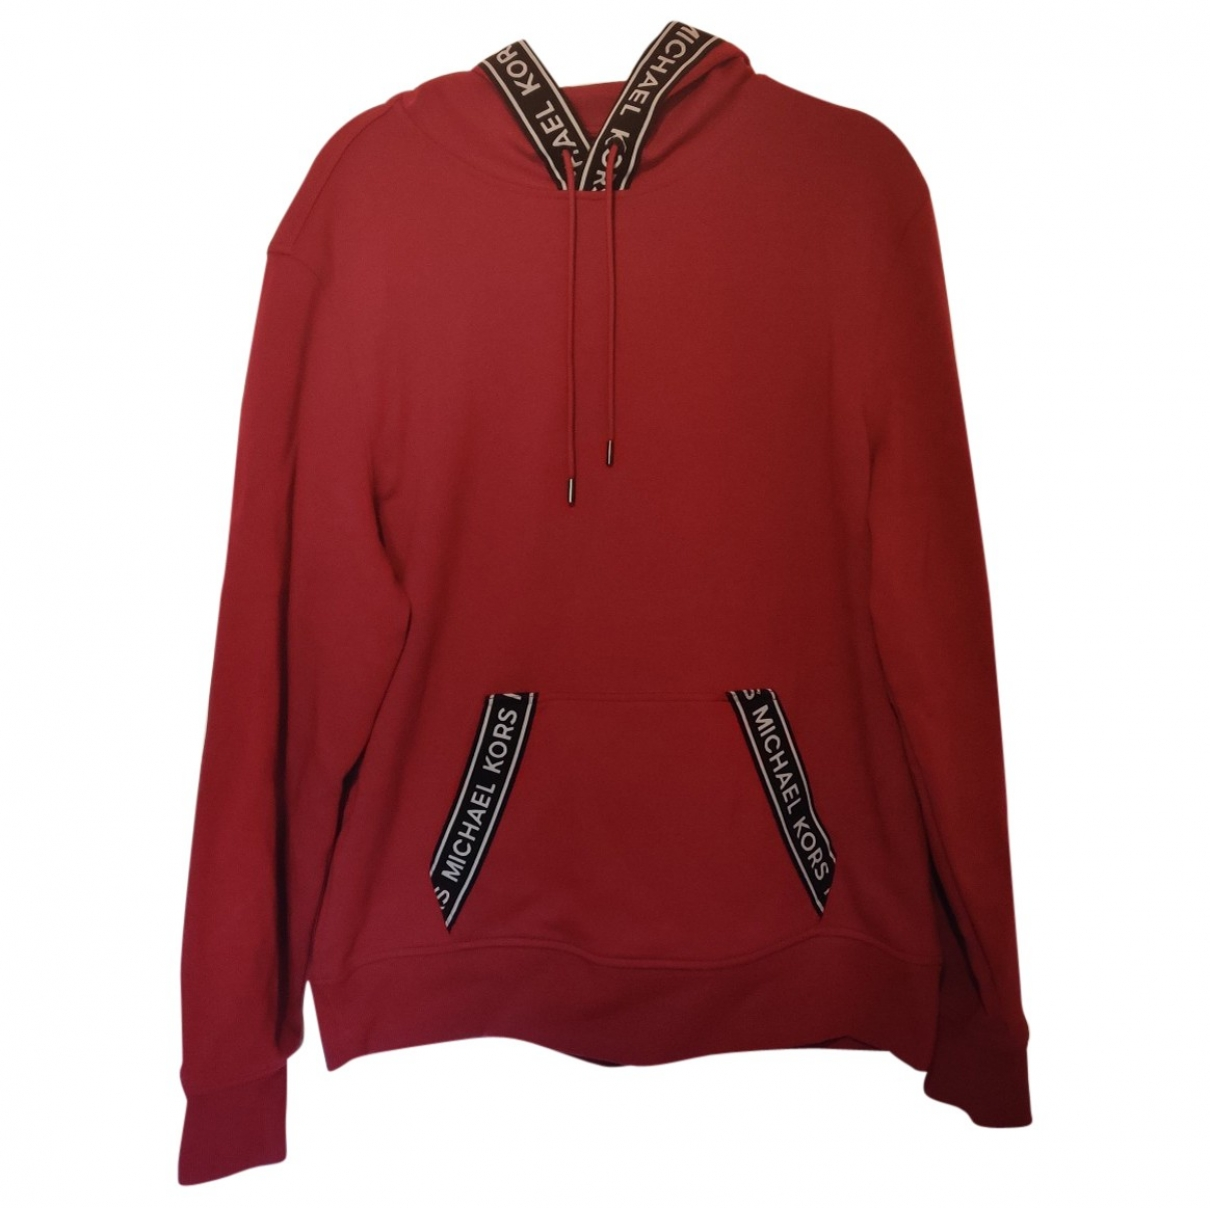 Michael Kors \N Red Cotton Knitwear & Sweatshirts for Men L International